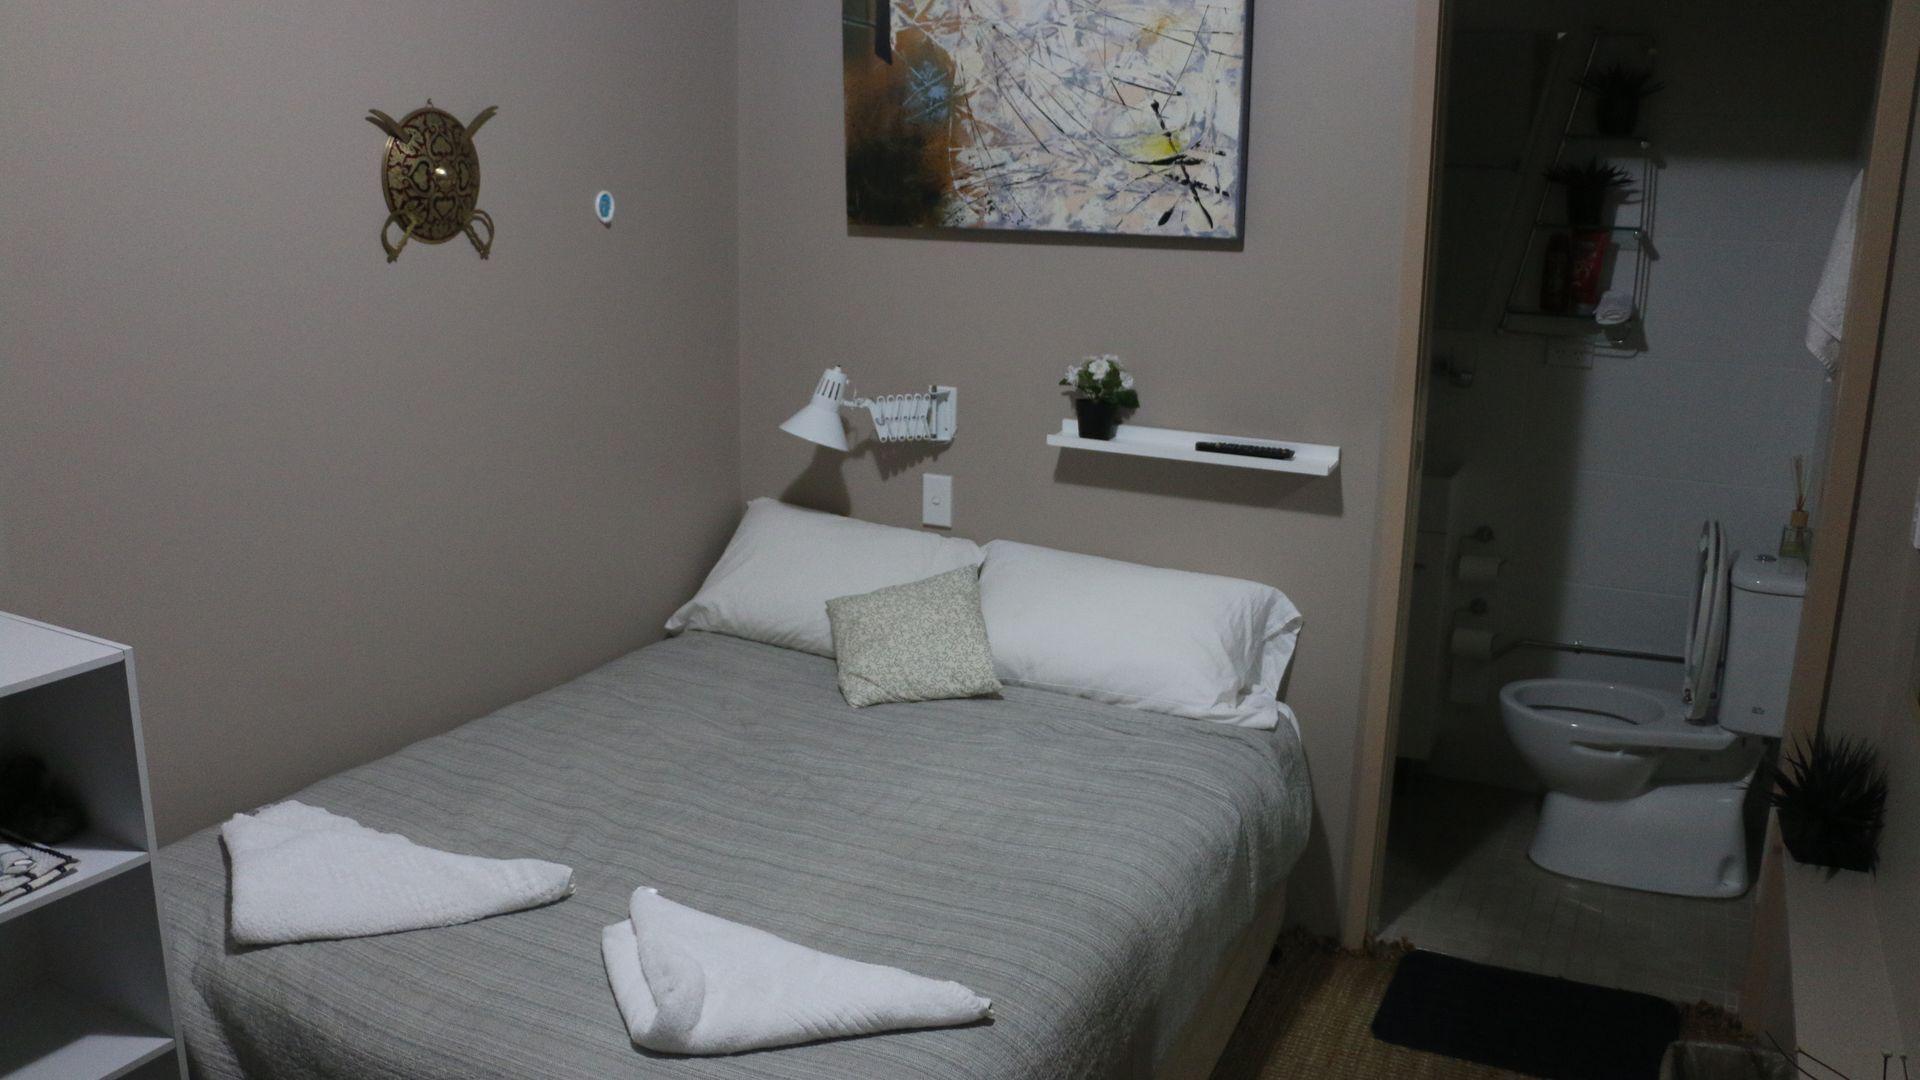 Westside Studio Apartments Room 5